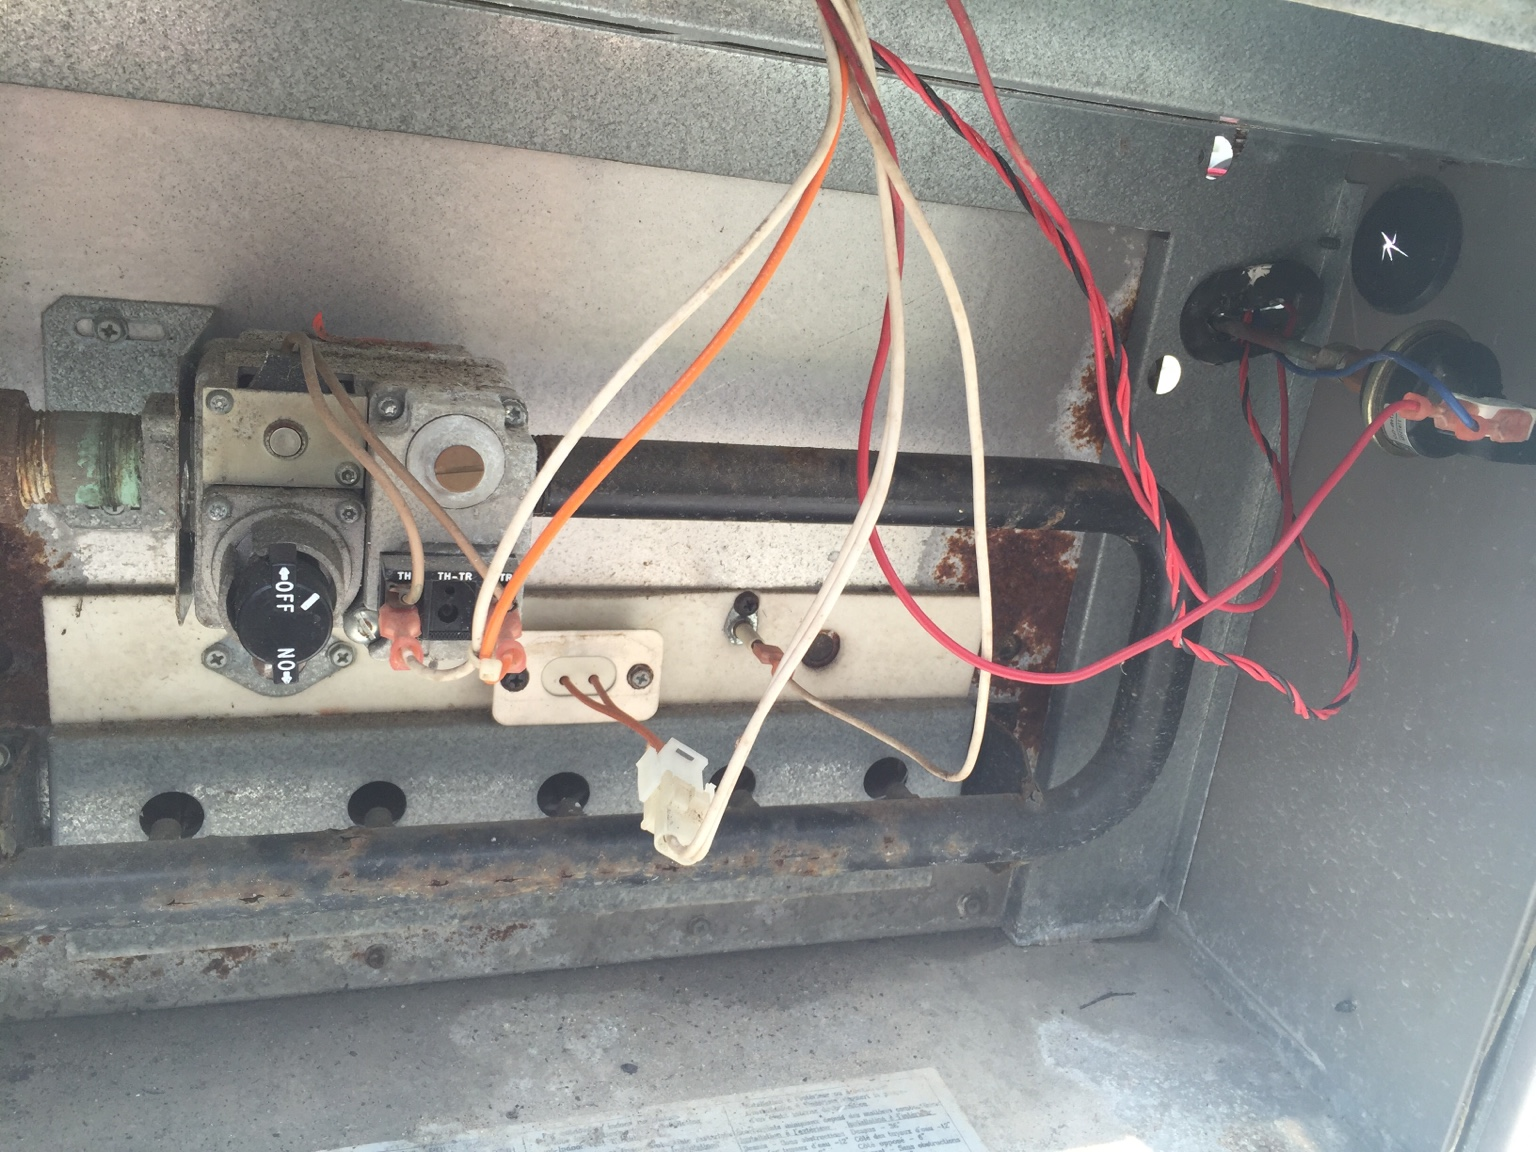 e08c05428816f1d566007e83f6986d3f hayward h250 help hayward h250 pool heater wiring diagram at readyjetset.co